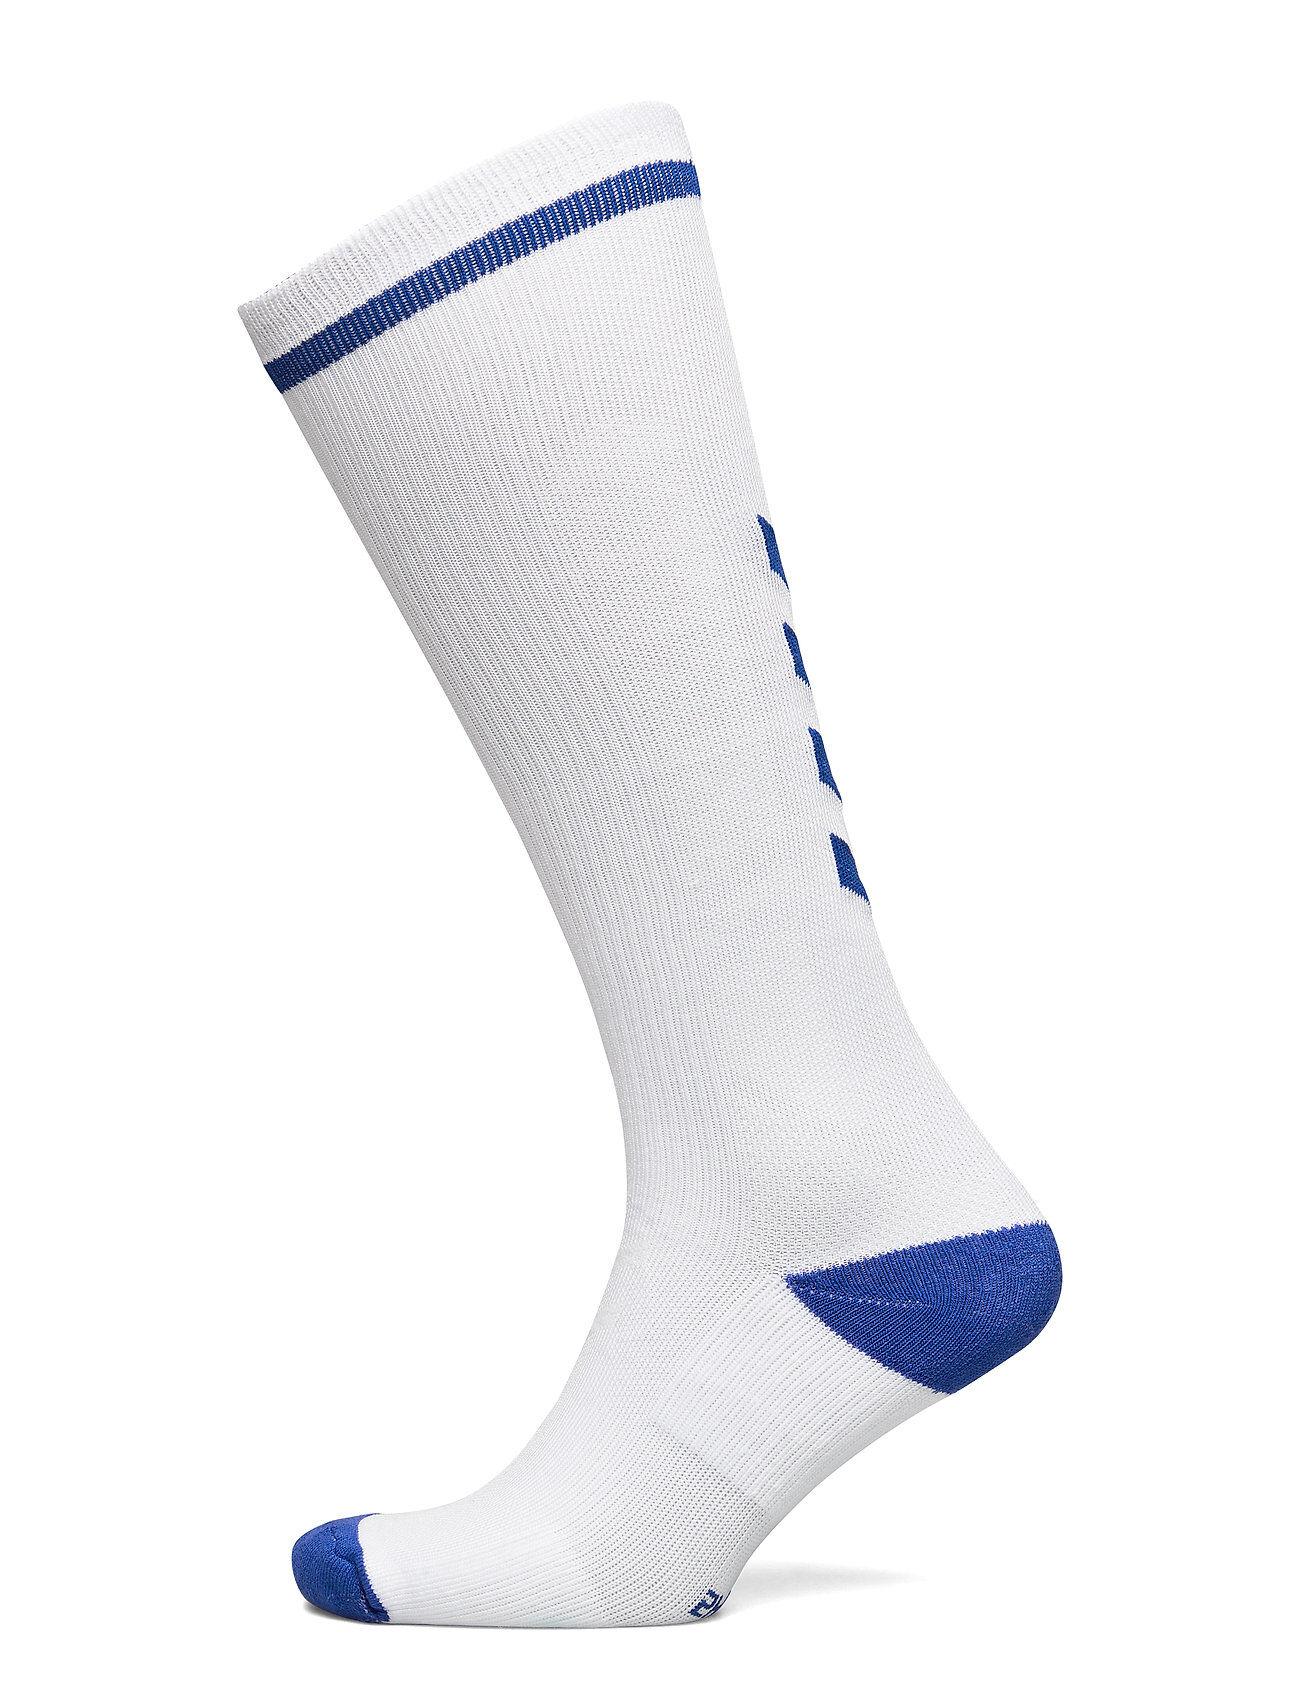 Hummel Elite Indoor Sock High Underwear Socks Football Socks Hvit Hummel